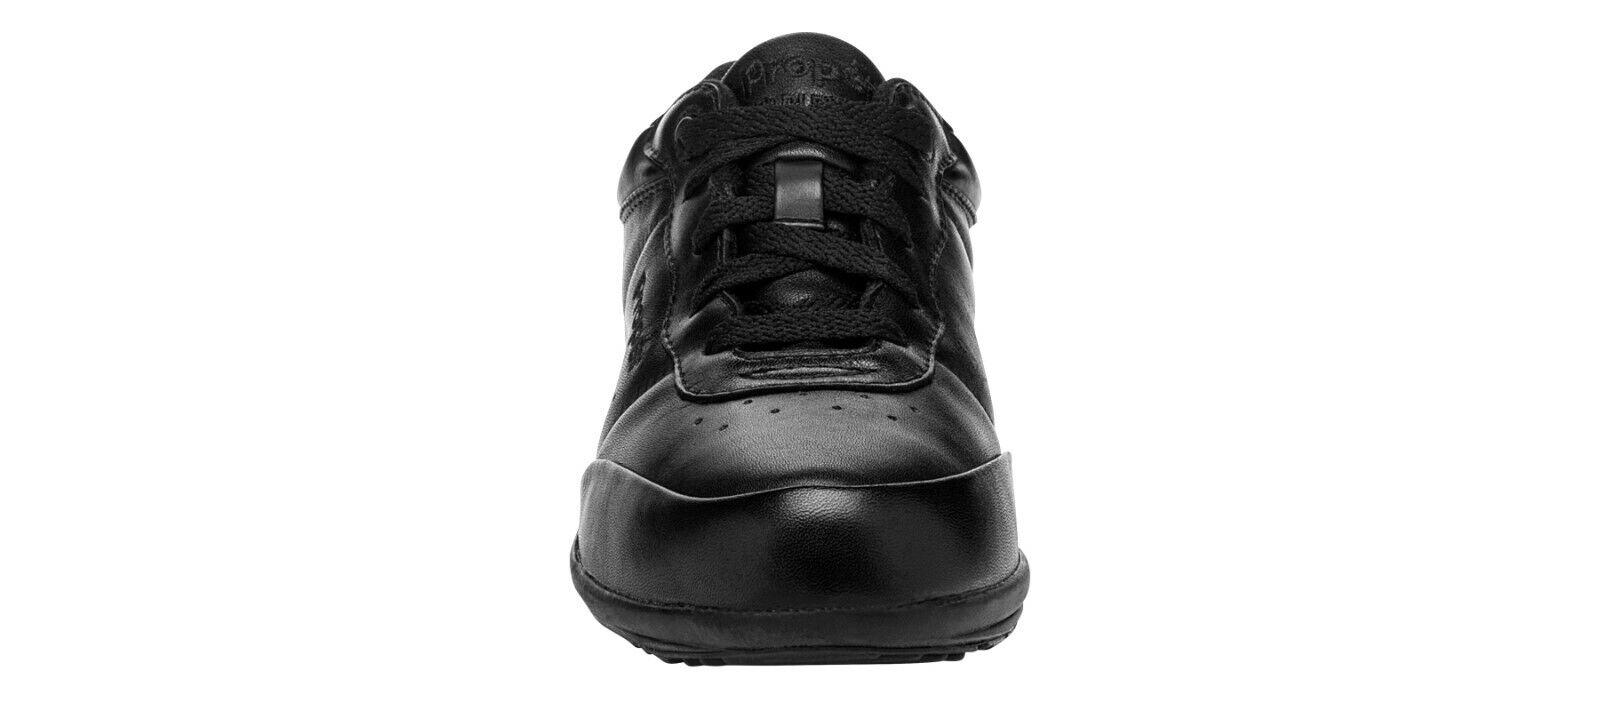 Propet Propet Propet W3840SR Black Washable Walker Slip Resistant Women's size 6 wide fe8a17